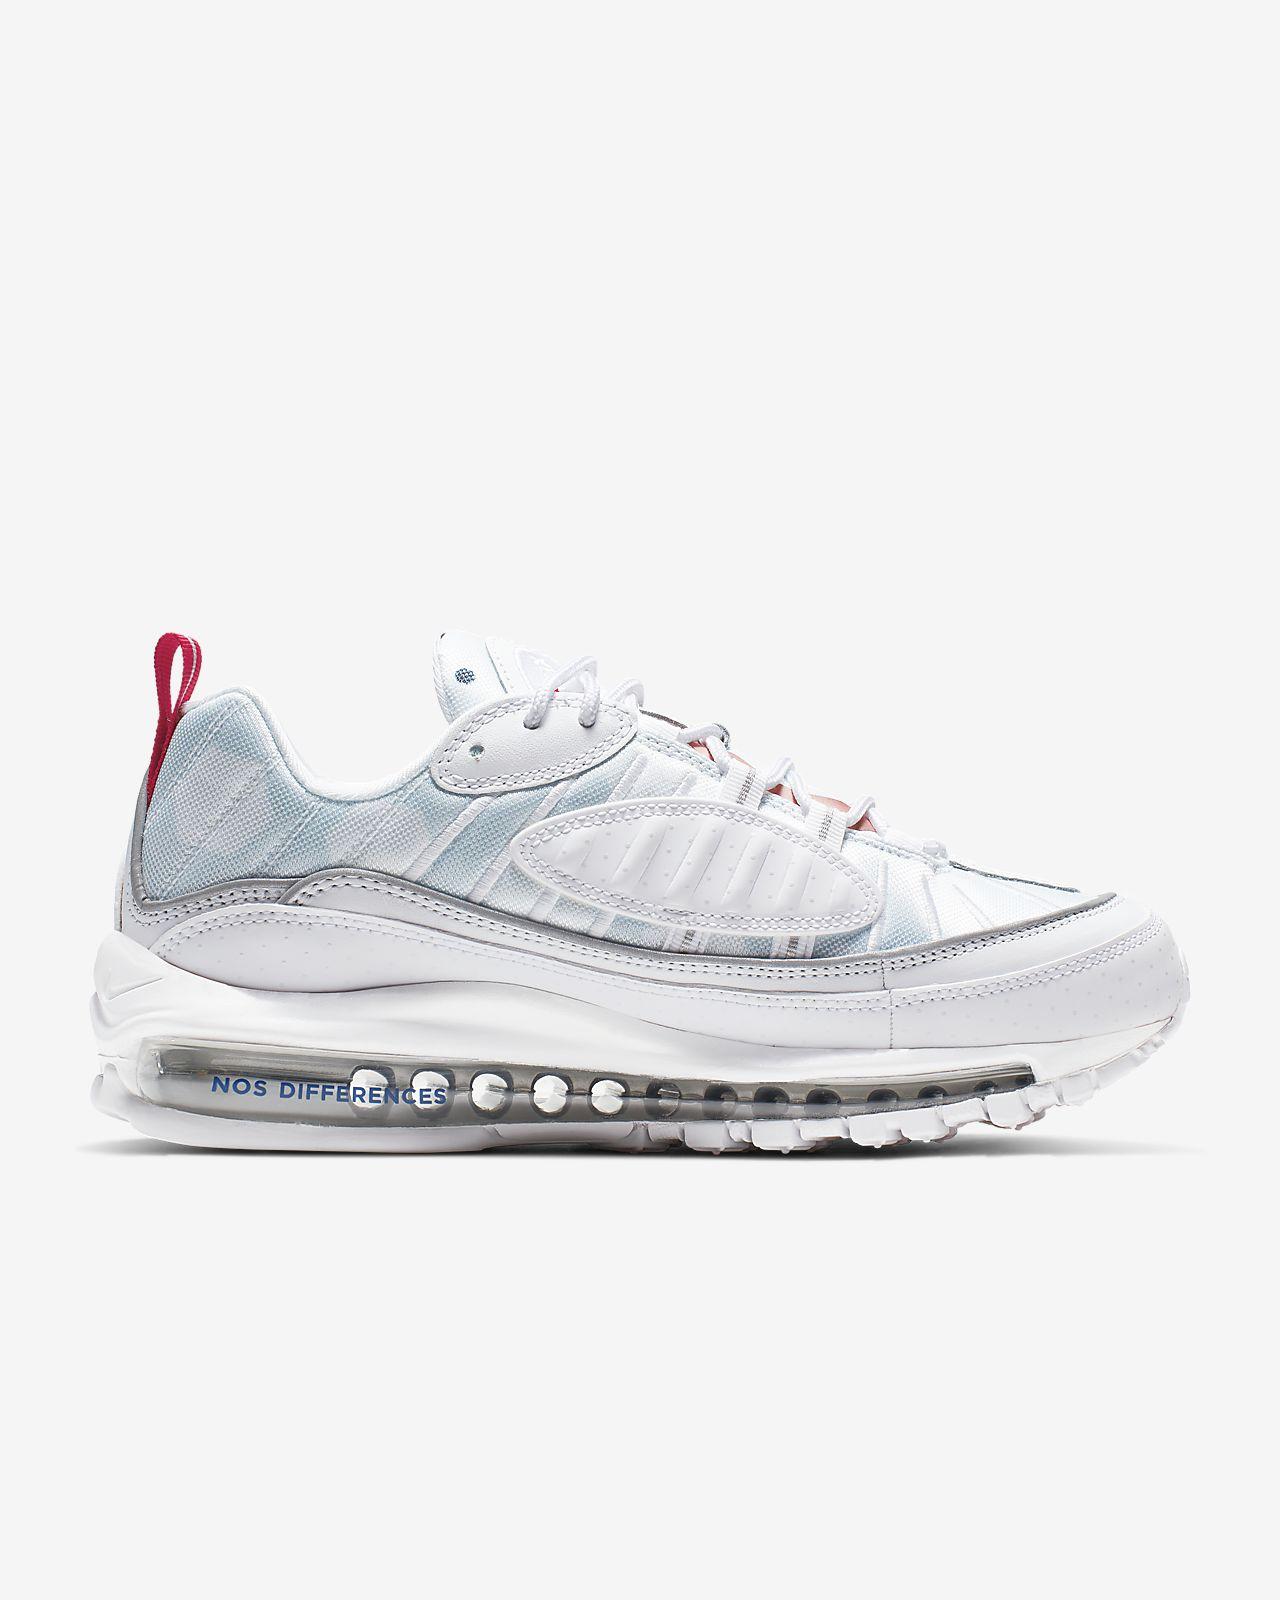 Nike Air Max 98 au meilleur prix | Octobre 2019 |